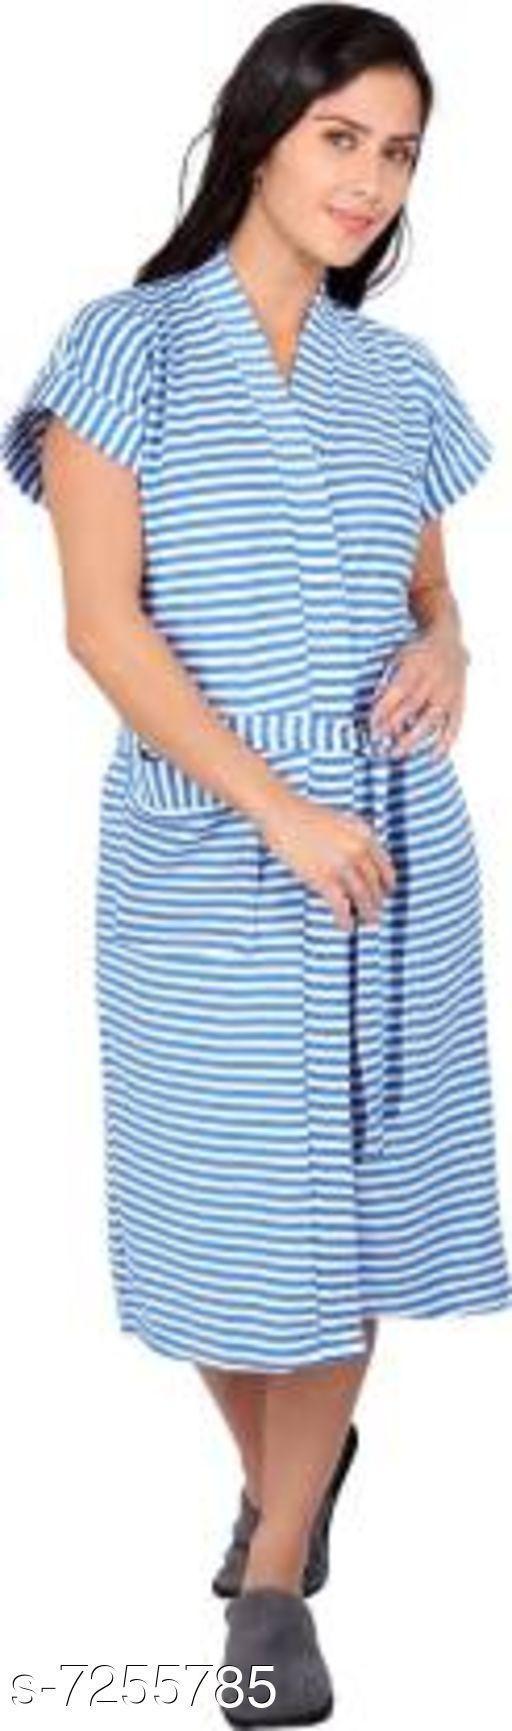 Trendy Women's Bathrobes